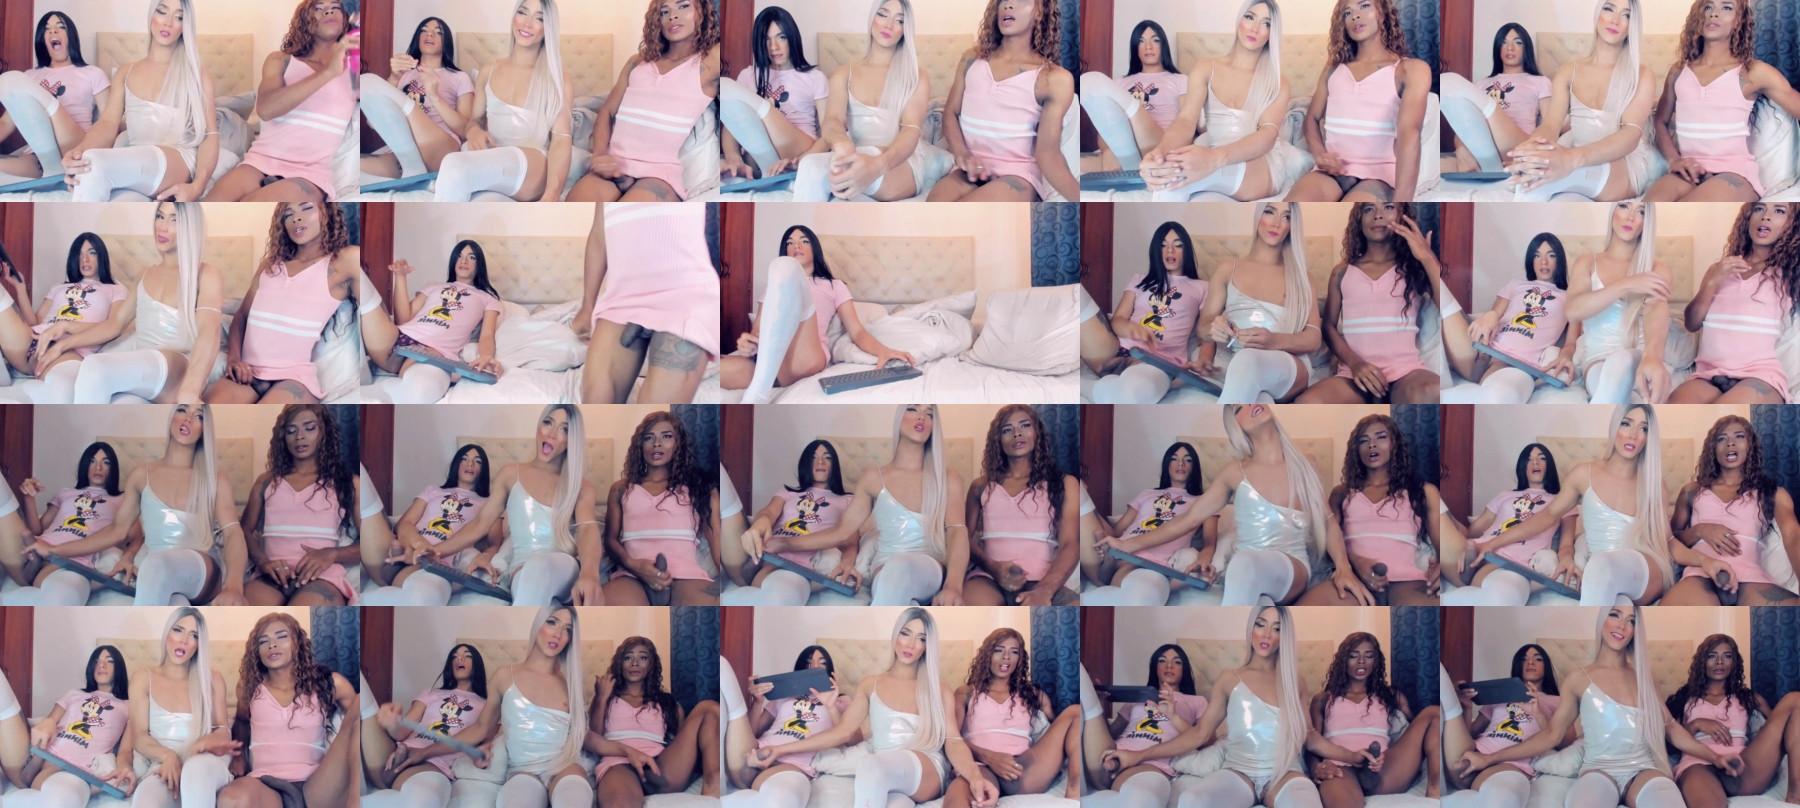 Valerynicolsantana Video CAM SHOW @ Chaturbate 12-06-2021